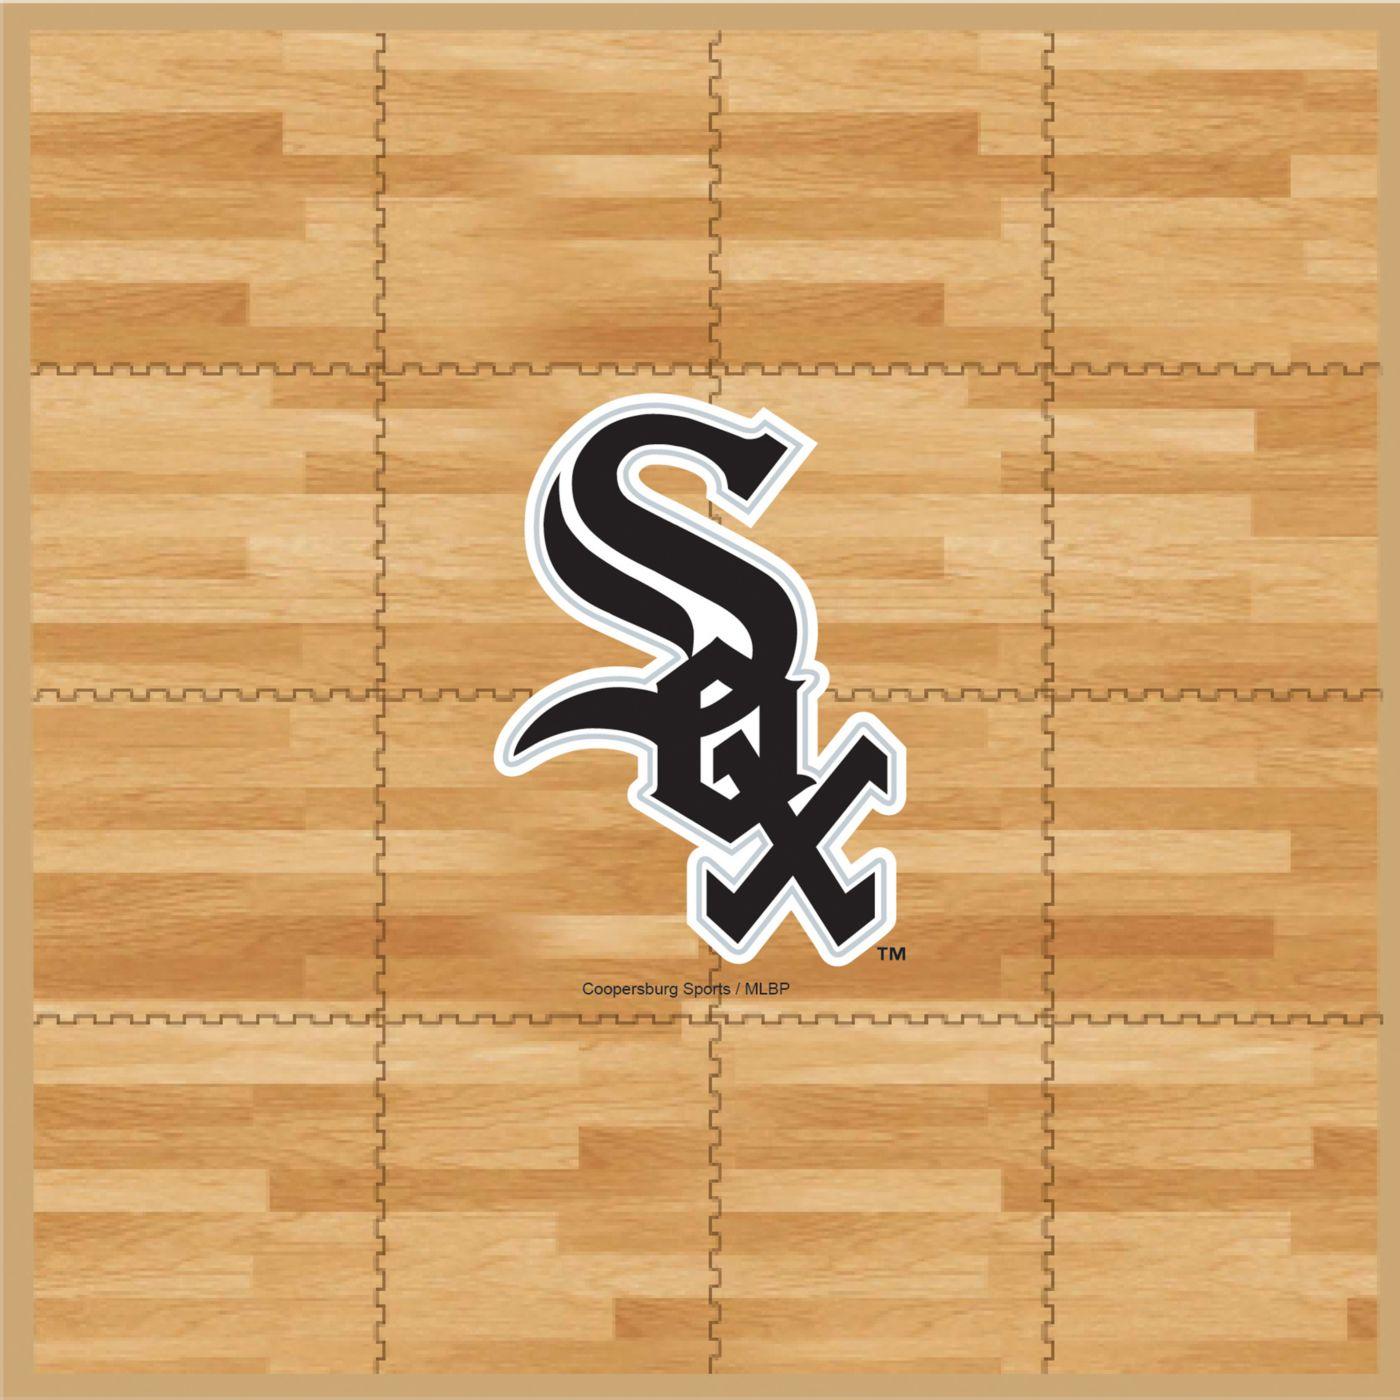 Coopersburg Sports Chicago White Sox Fan Floor